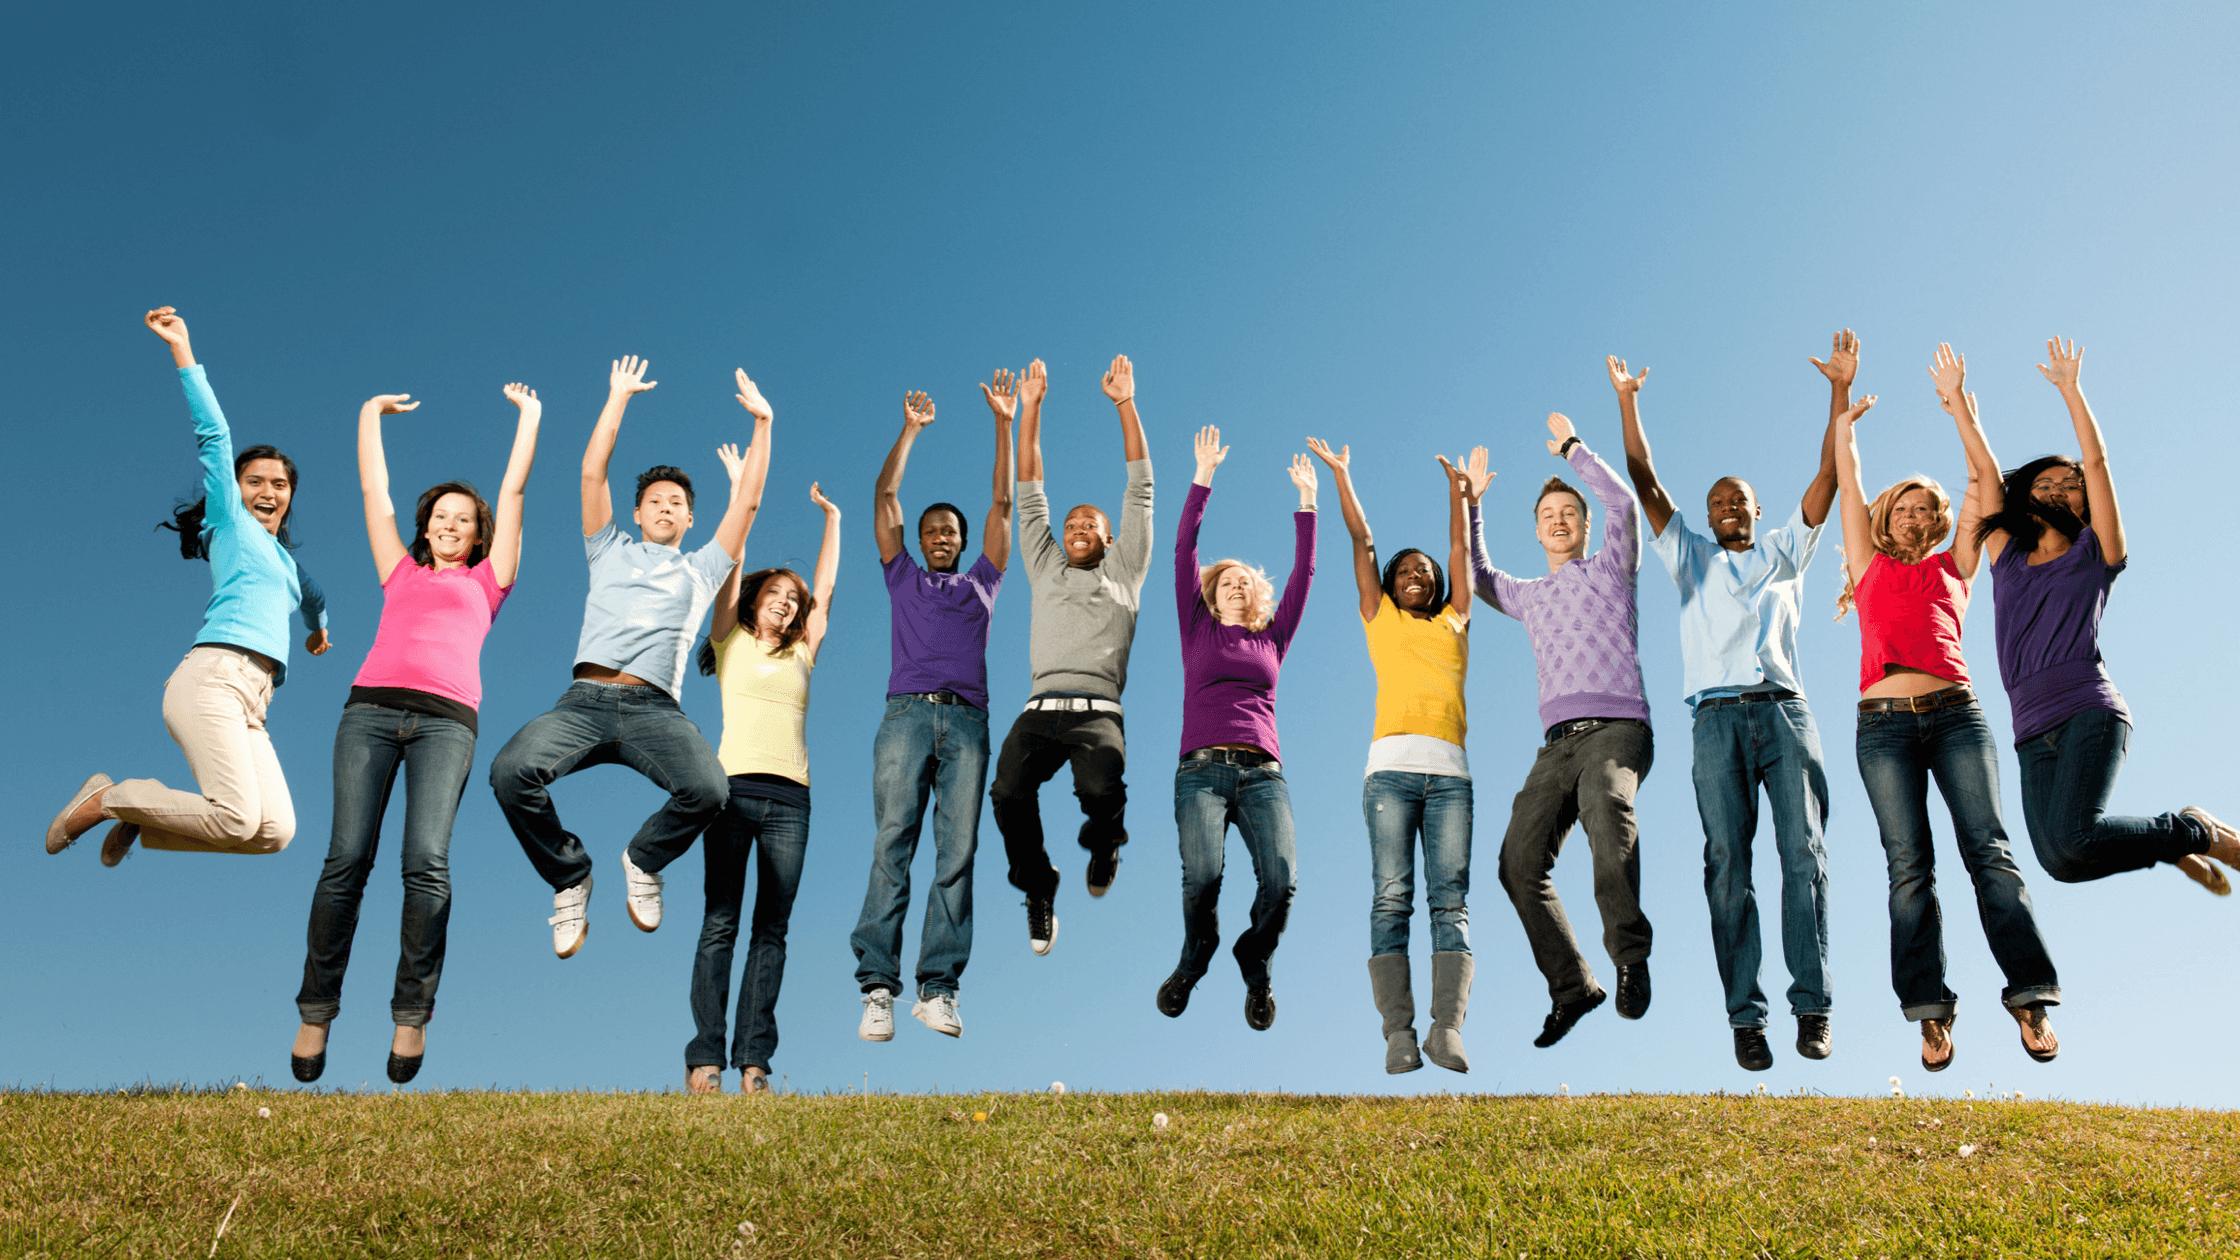 Teens jumping-raising teenagers